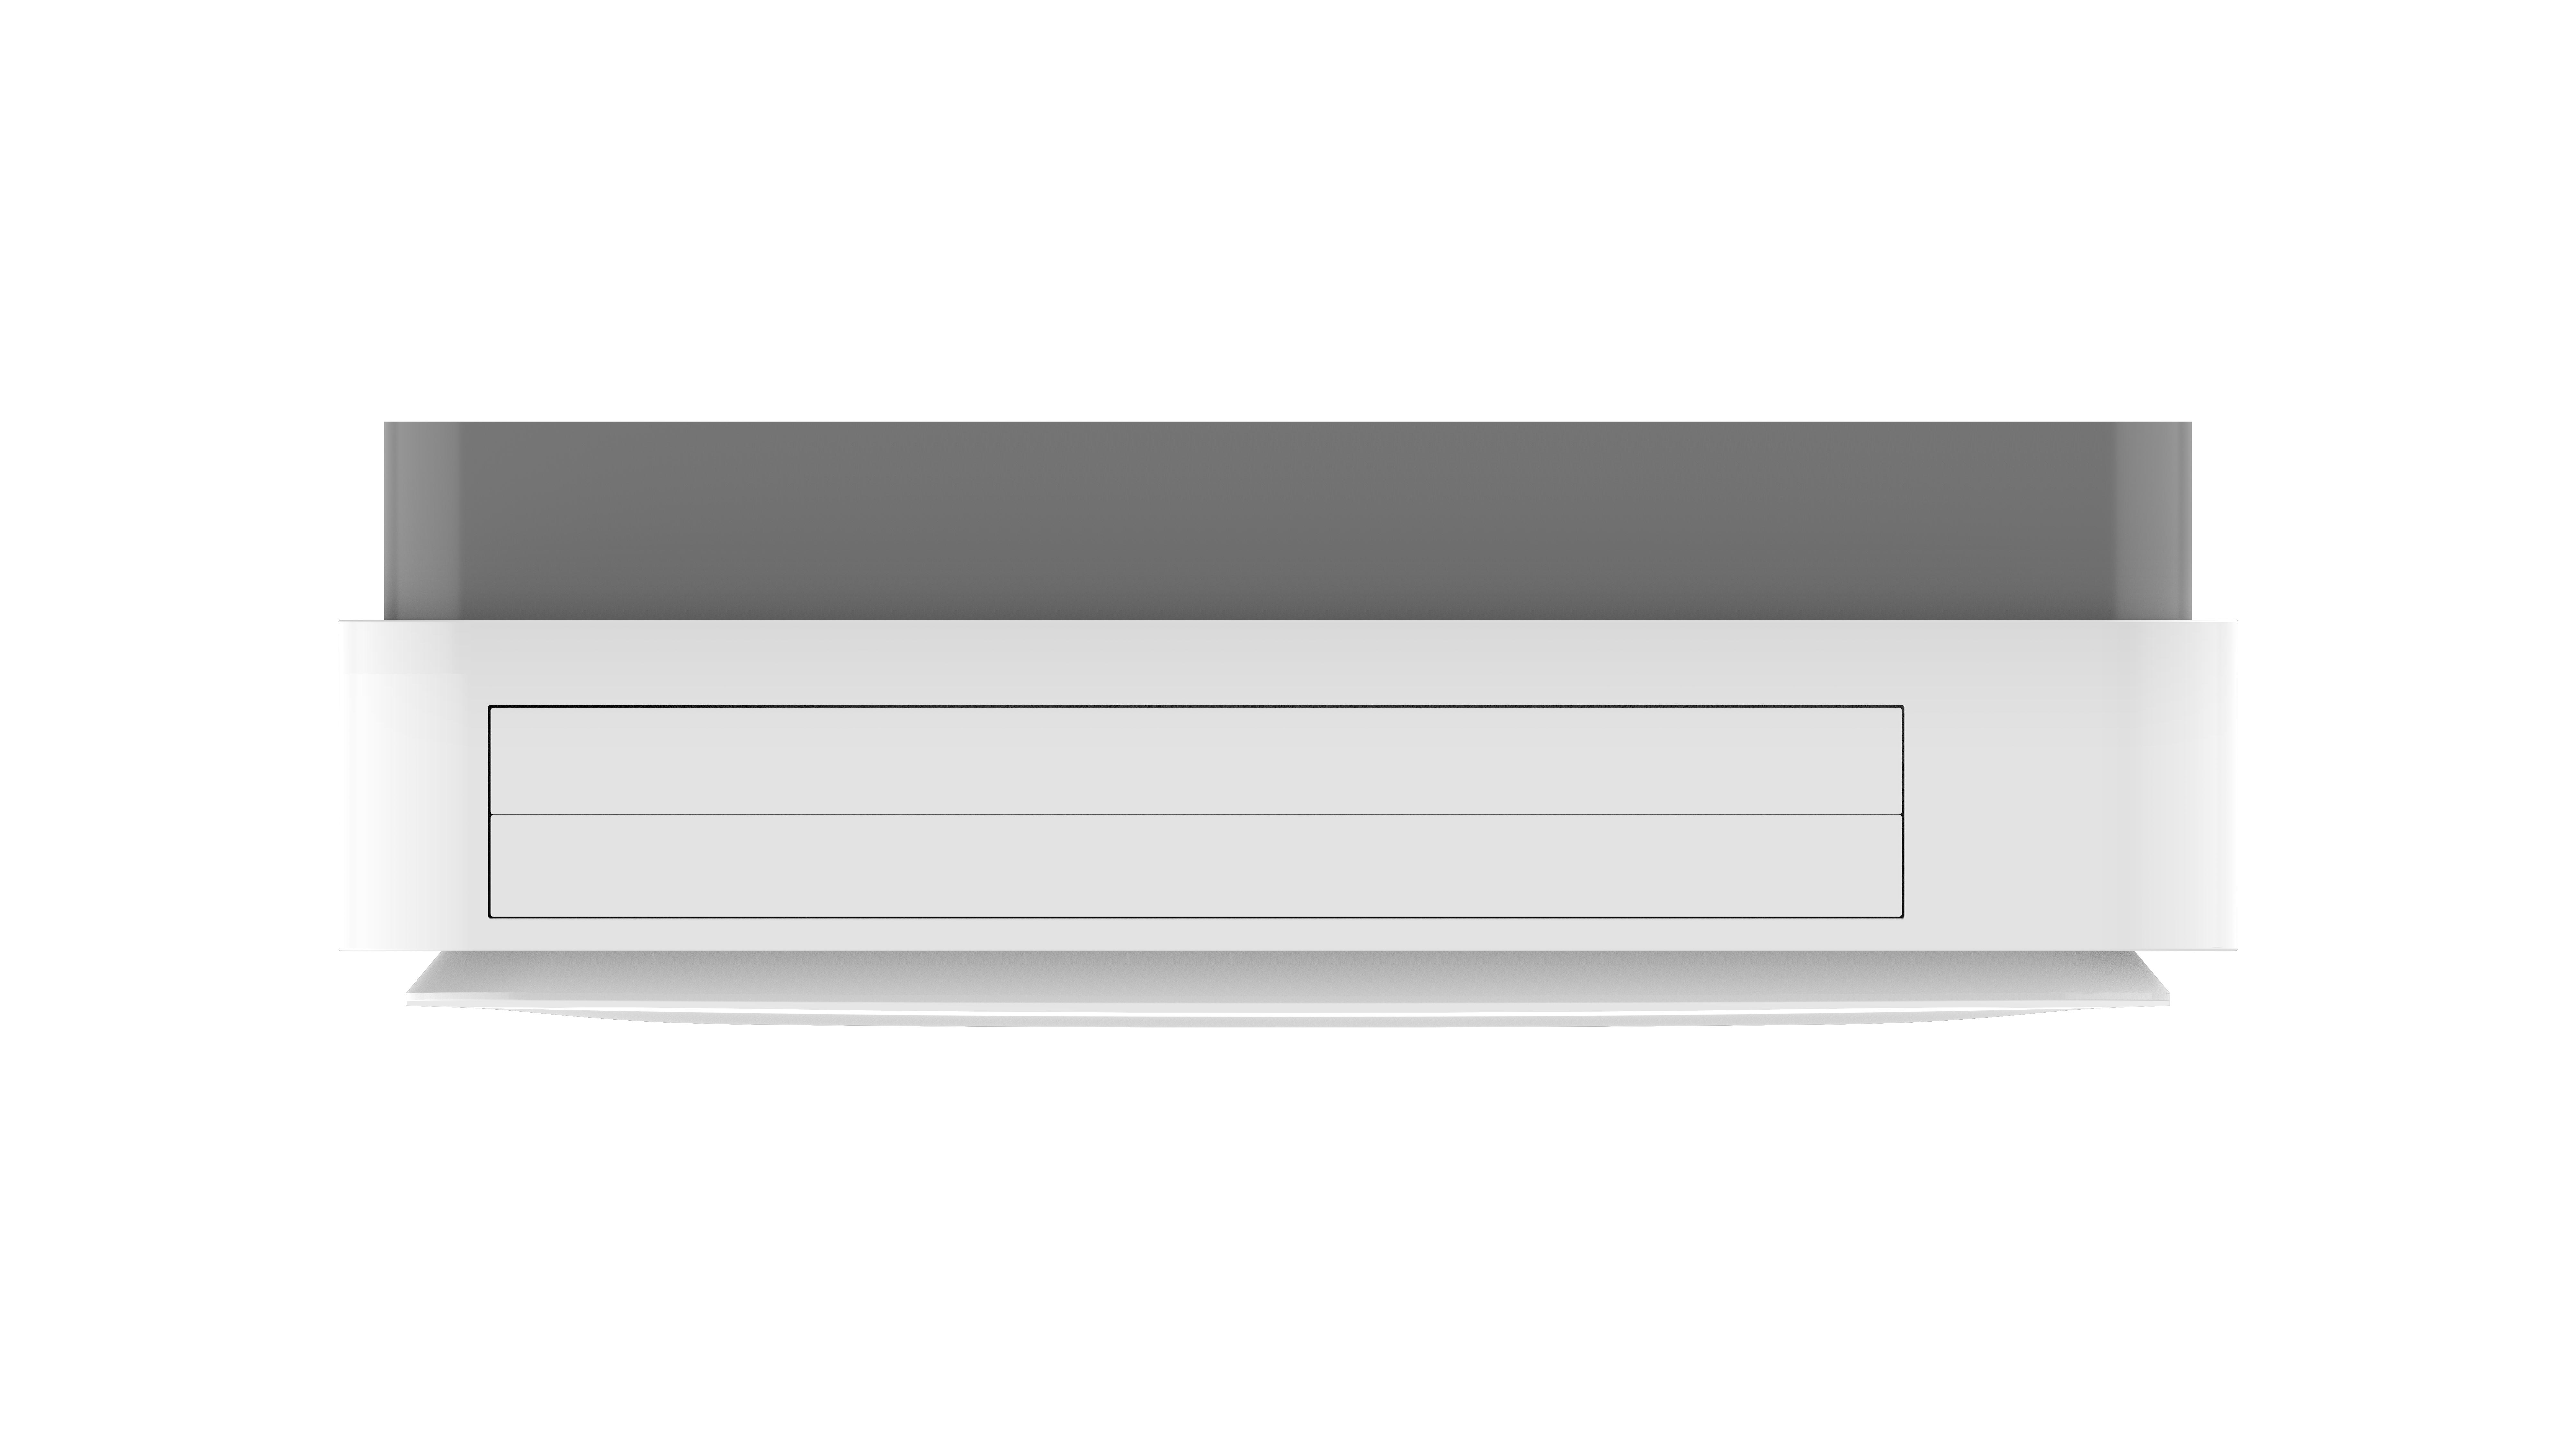 Consola Consola AKT35UR4RK4